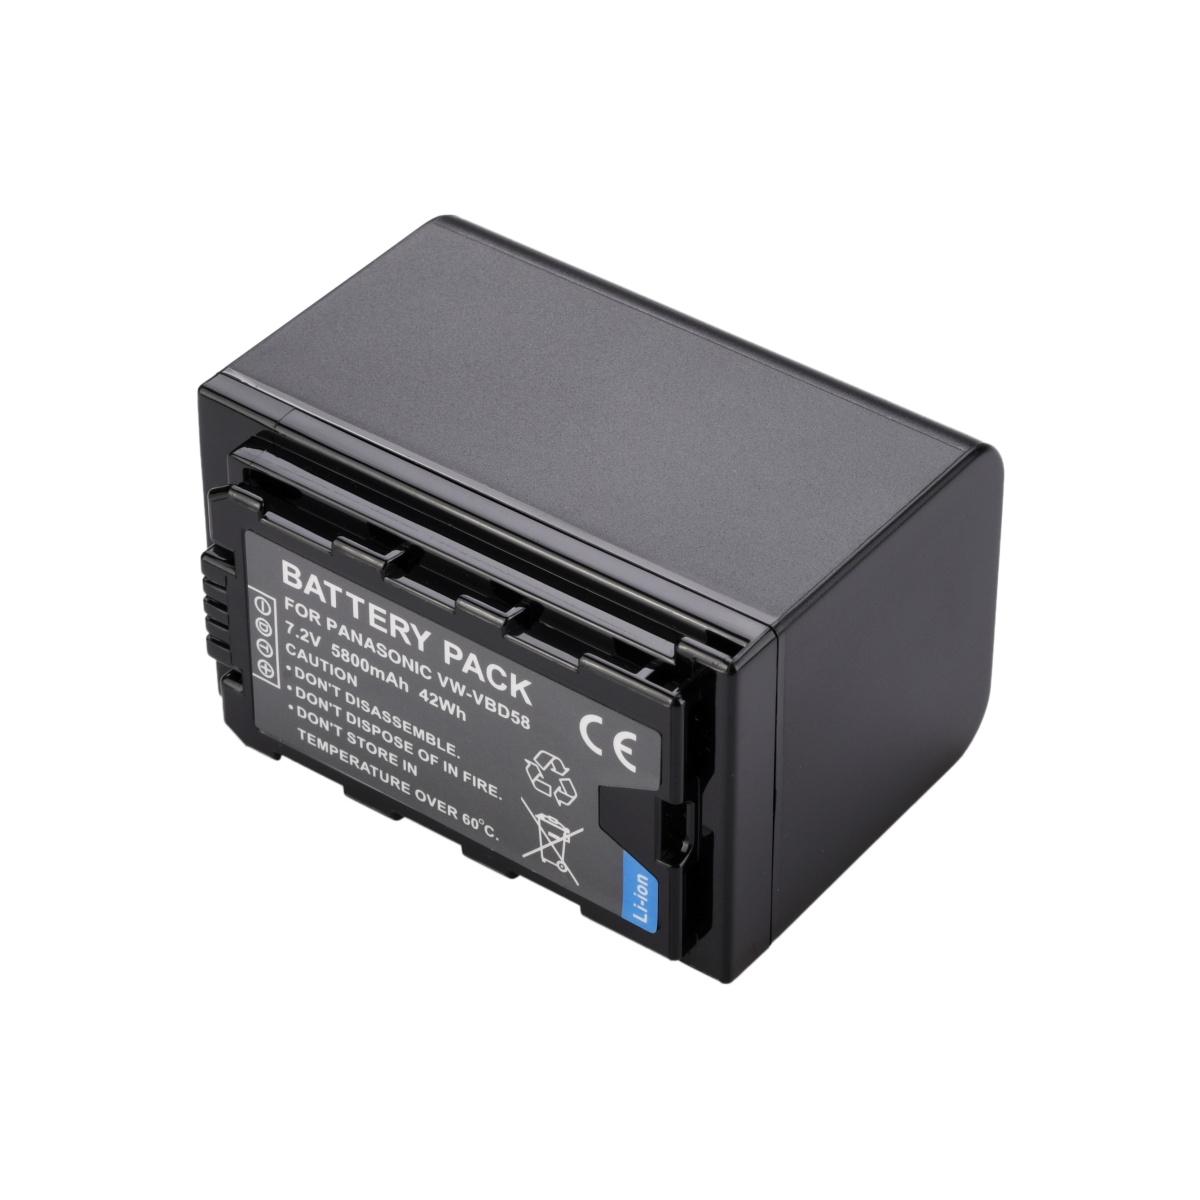 2 Vw-vbd58 + Carregador Para Panasonic AG-AC8 AJ-PX270 HC-X1000